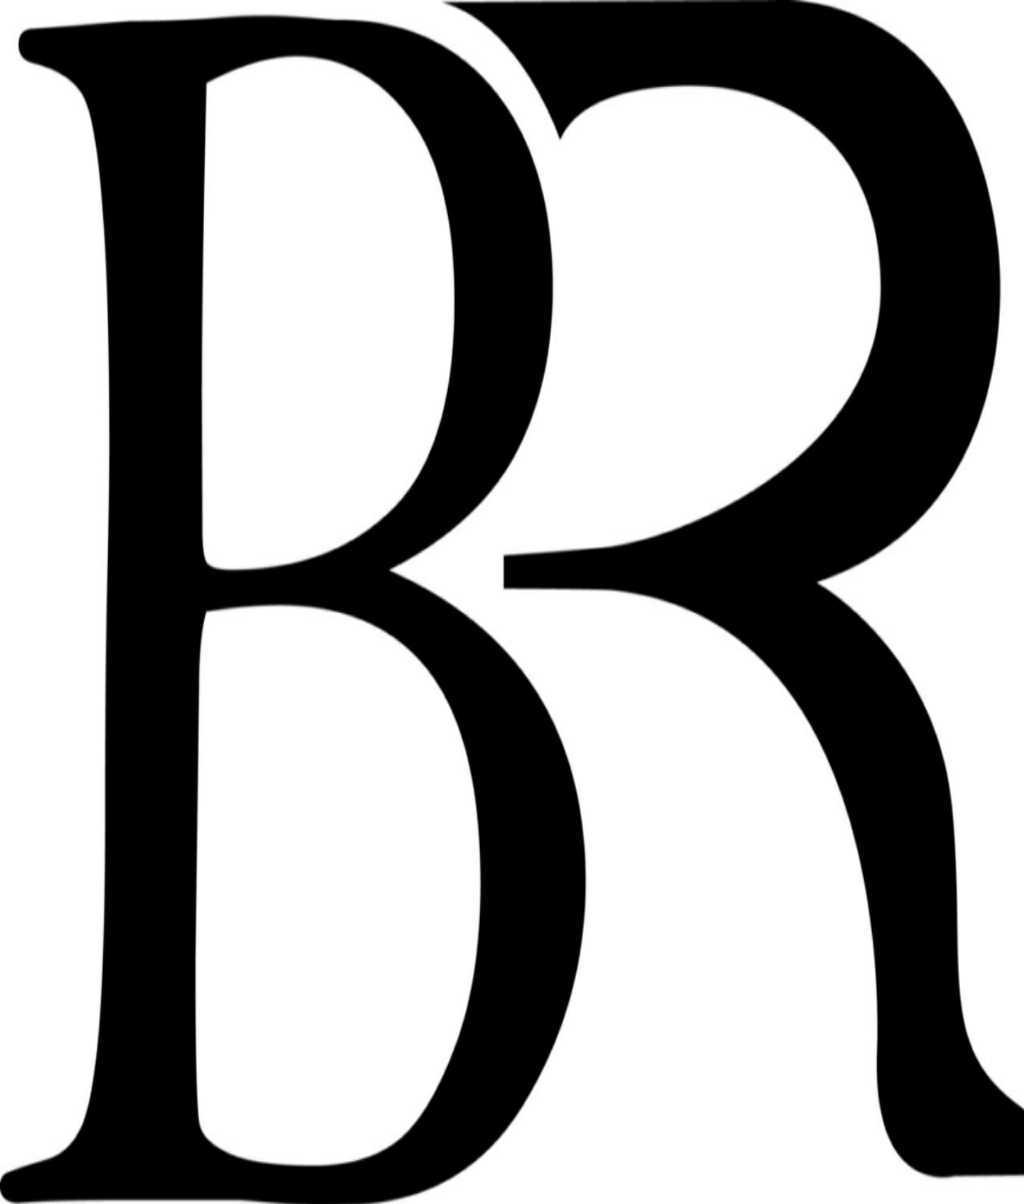 B R INC